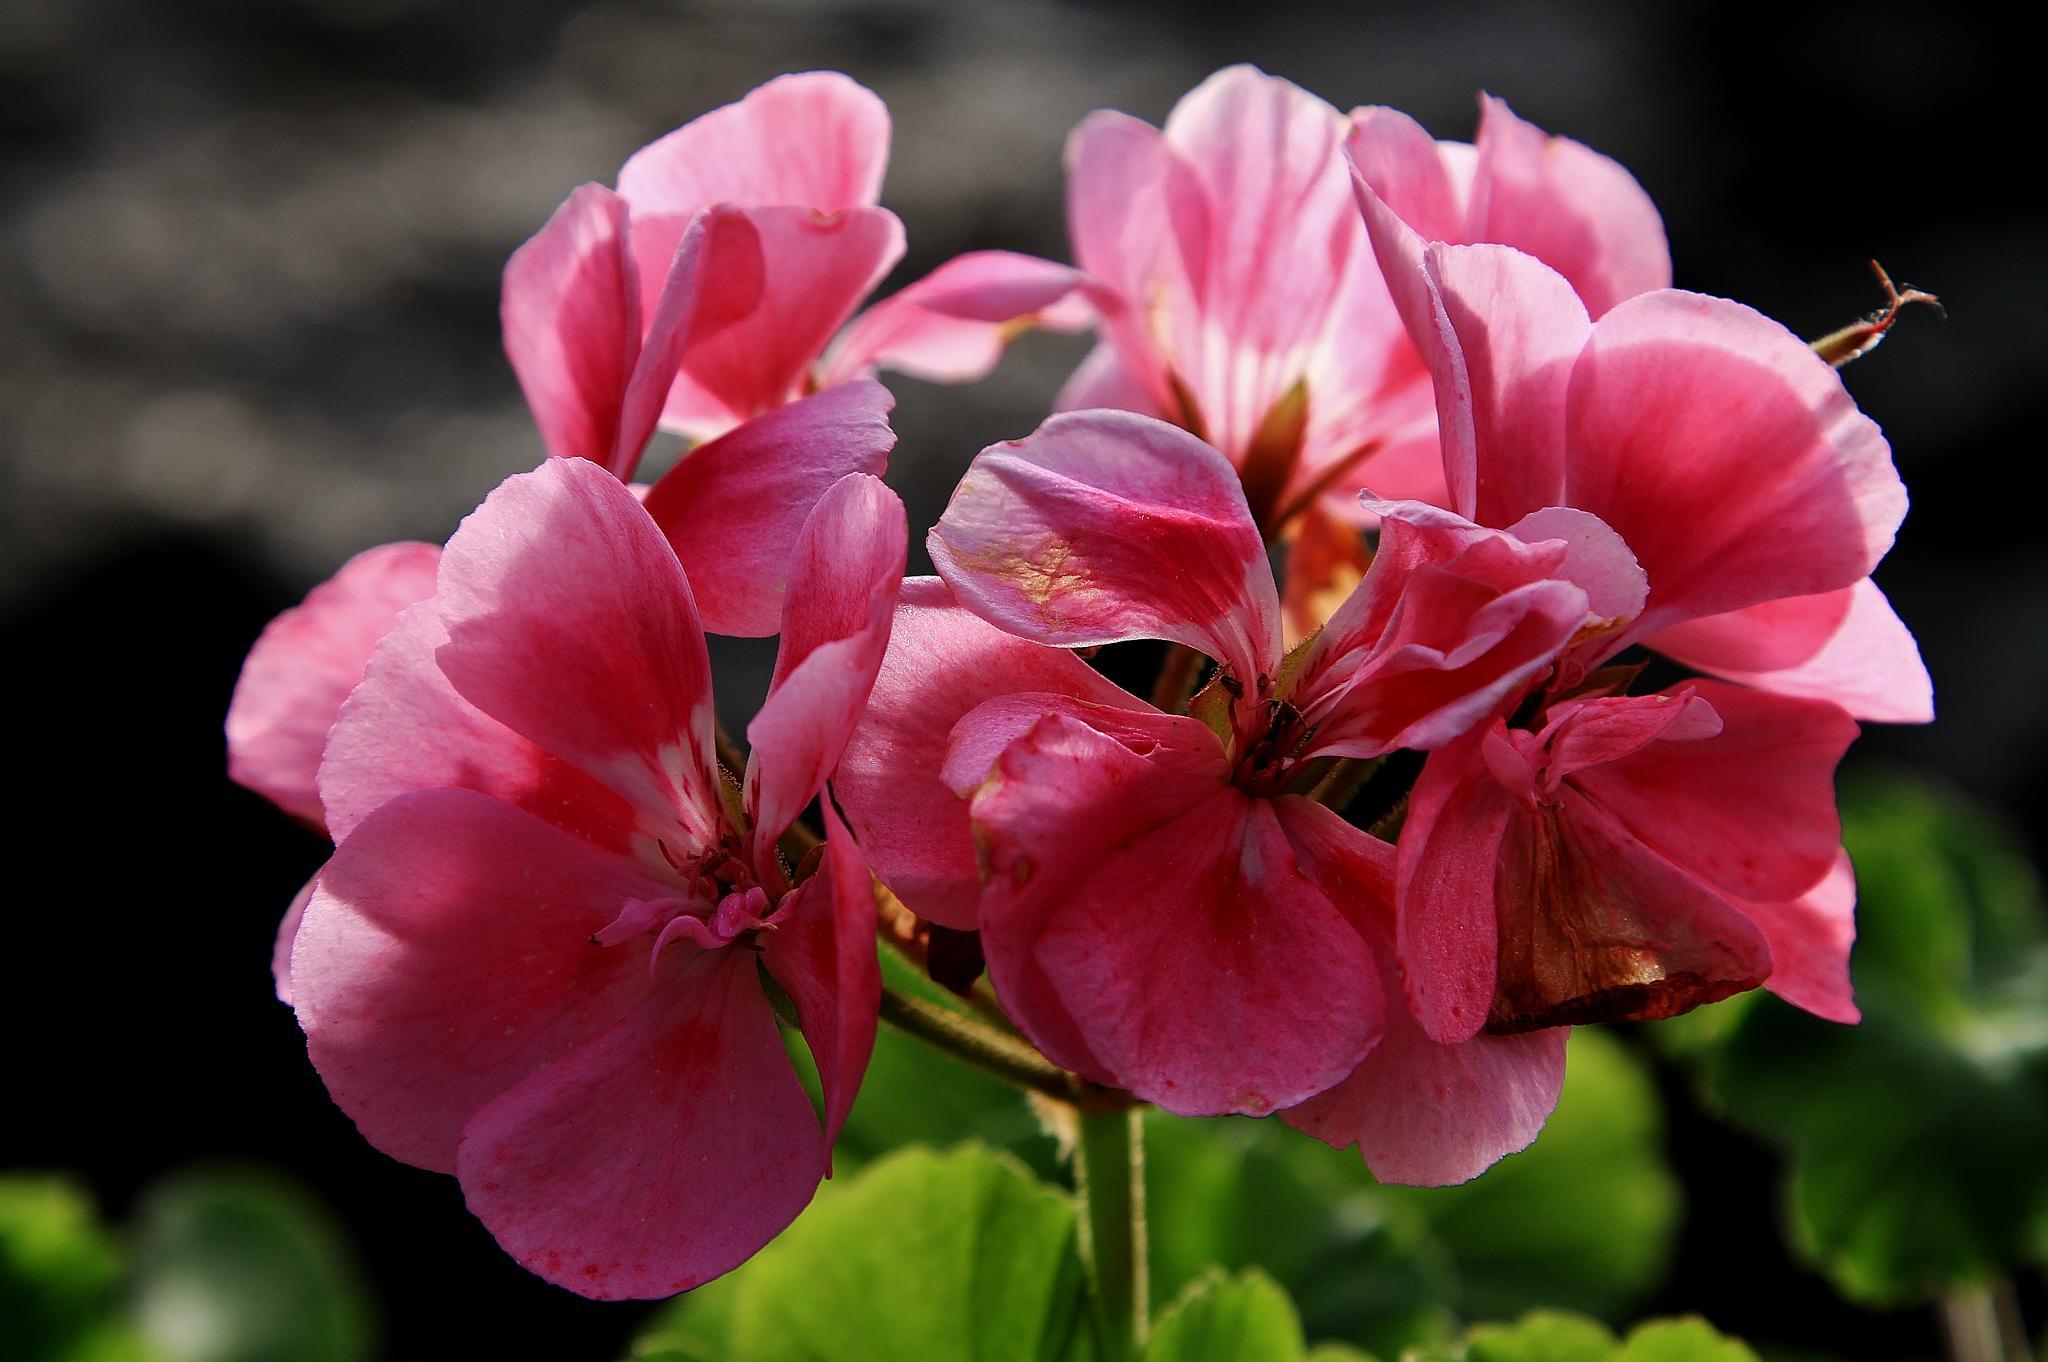 Blomma by maxlindholm.54